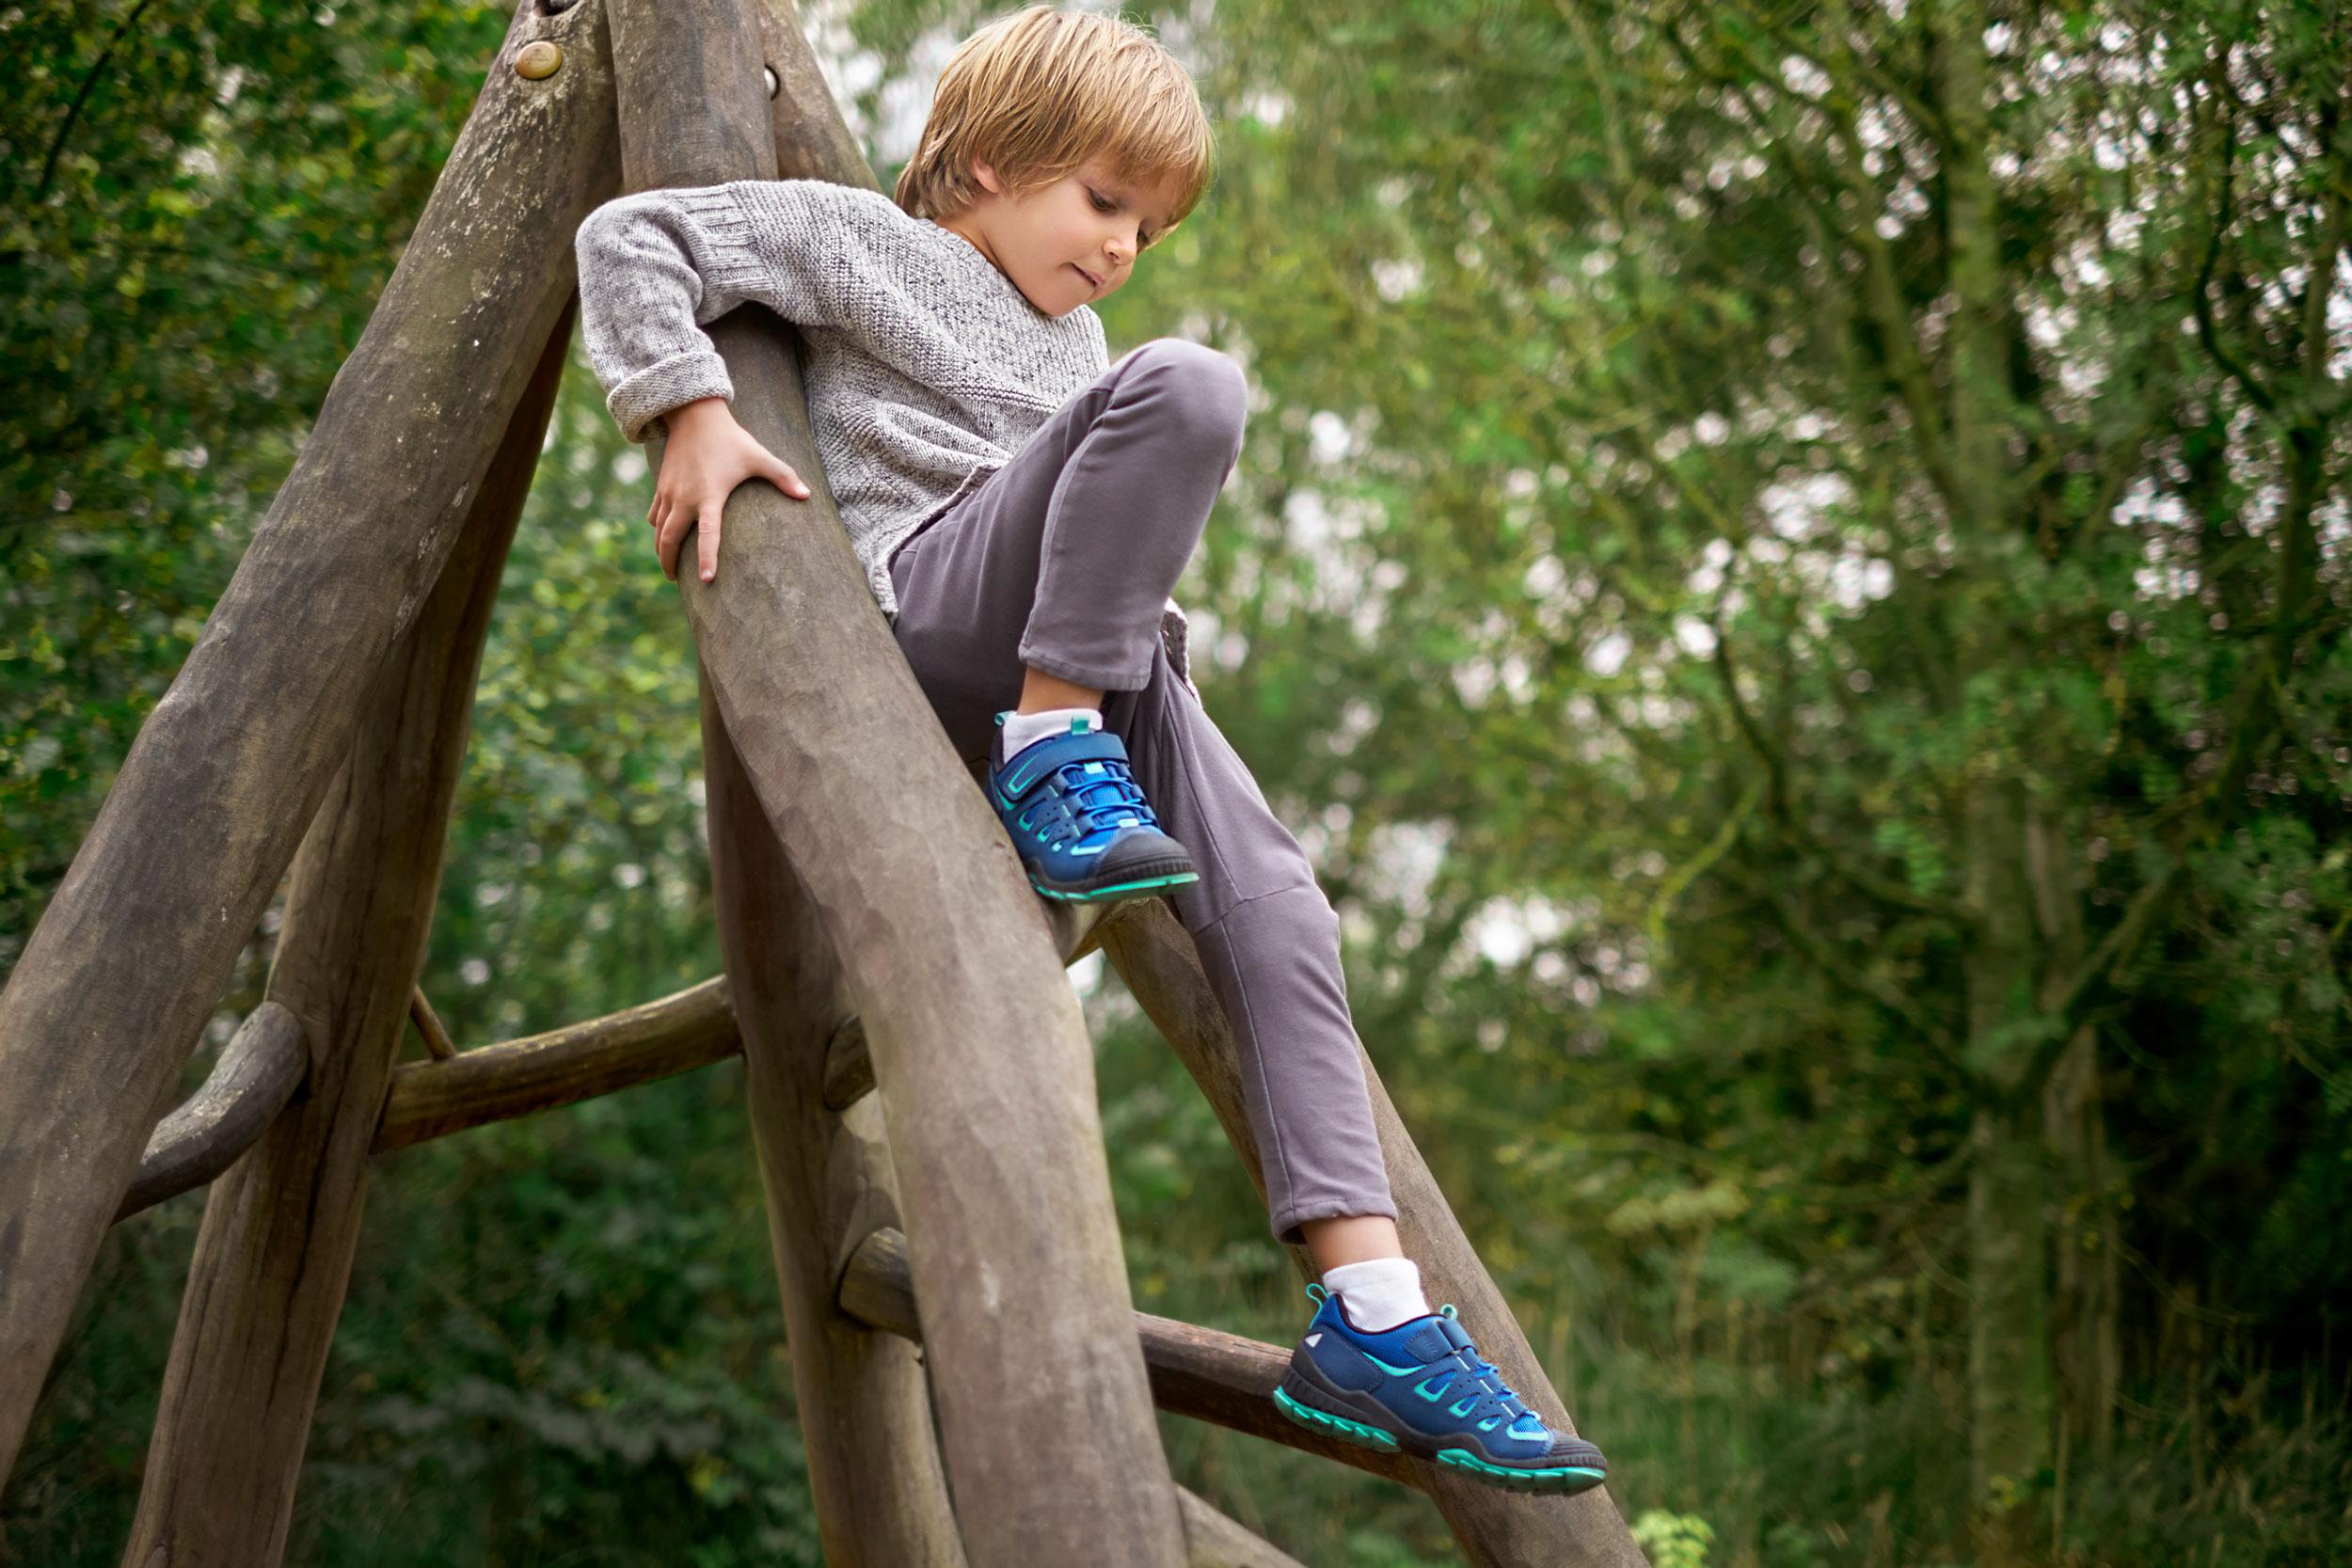 Start-rite-shoes-Fiona-Burrage-norwich-photographer-portrait.jpg